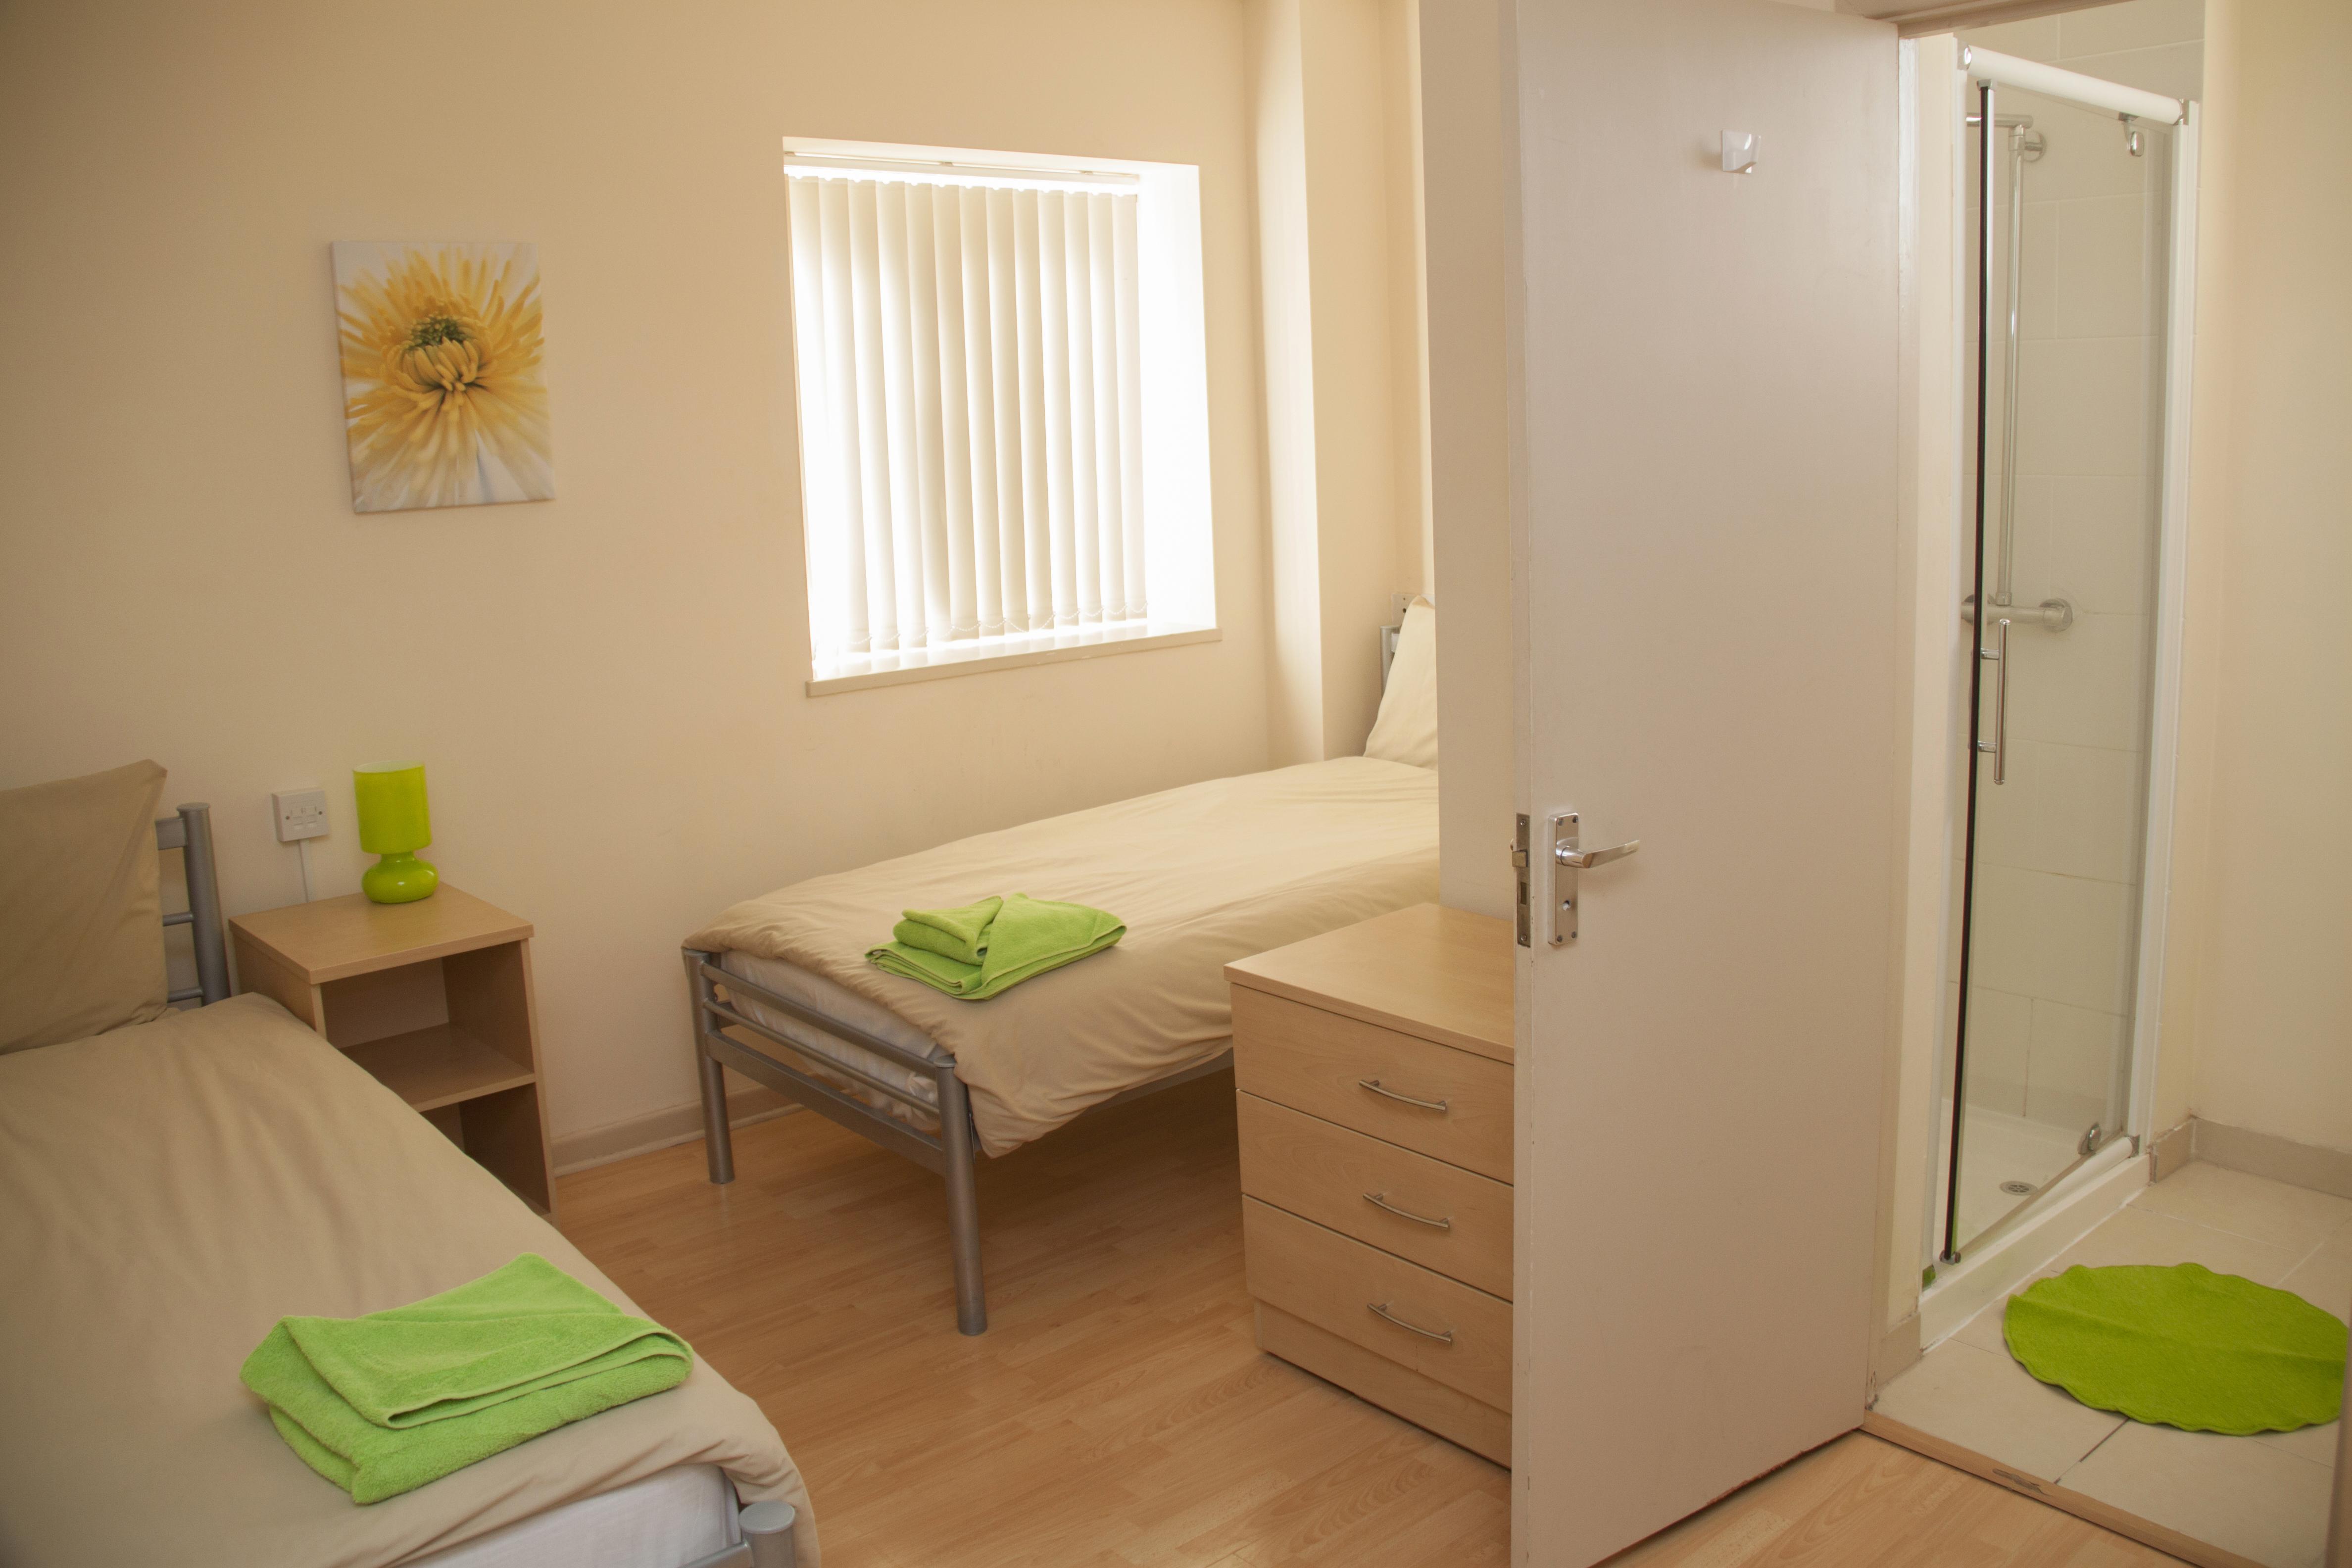 room-2b_15779062195_o.jpg